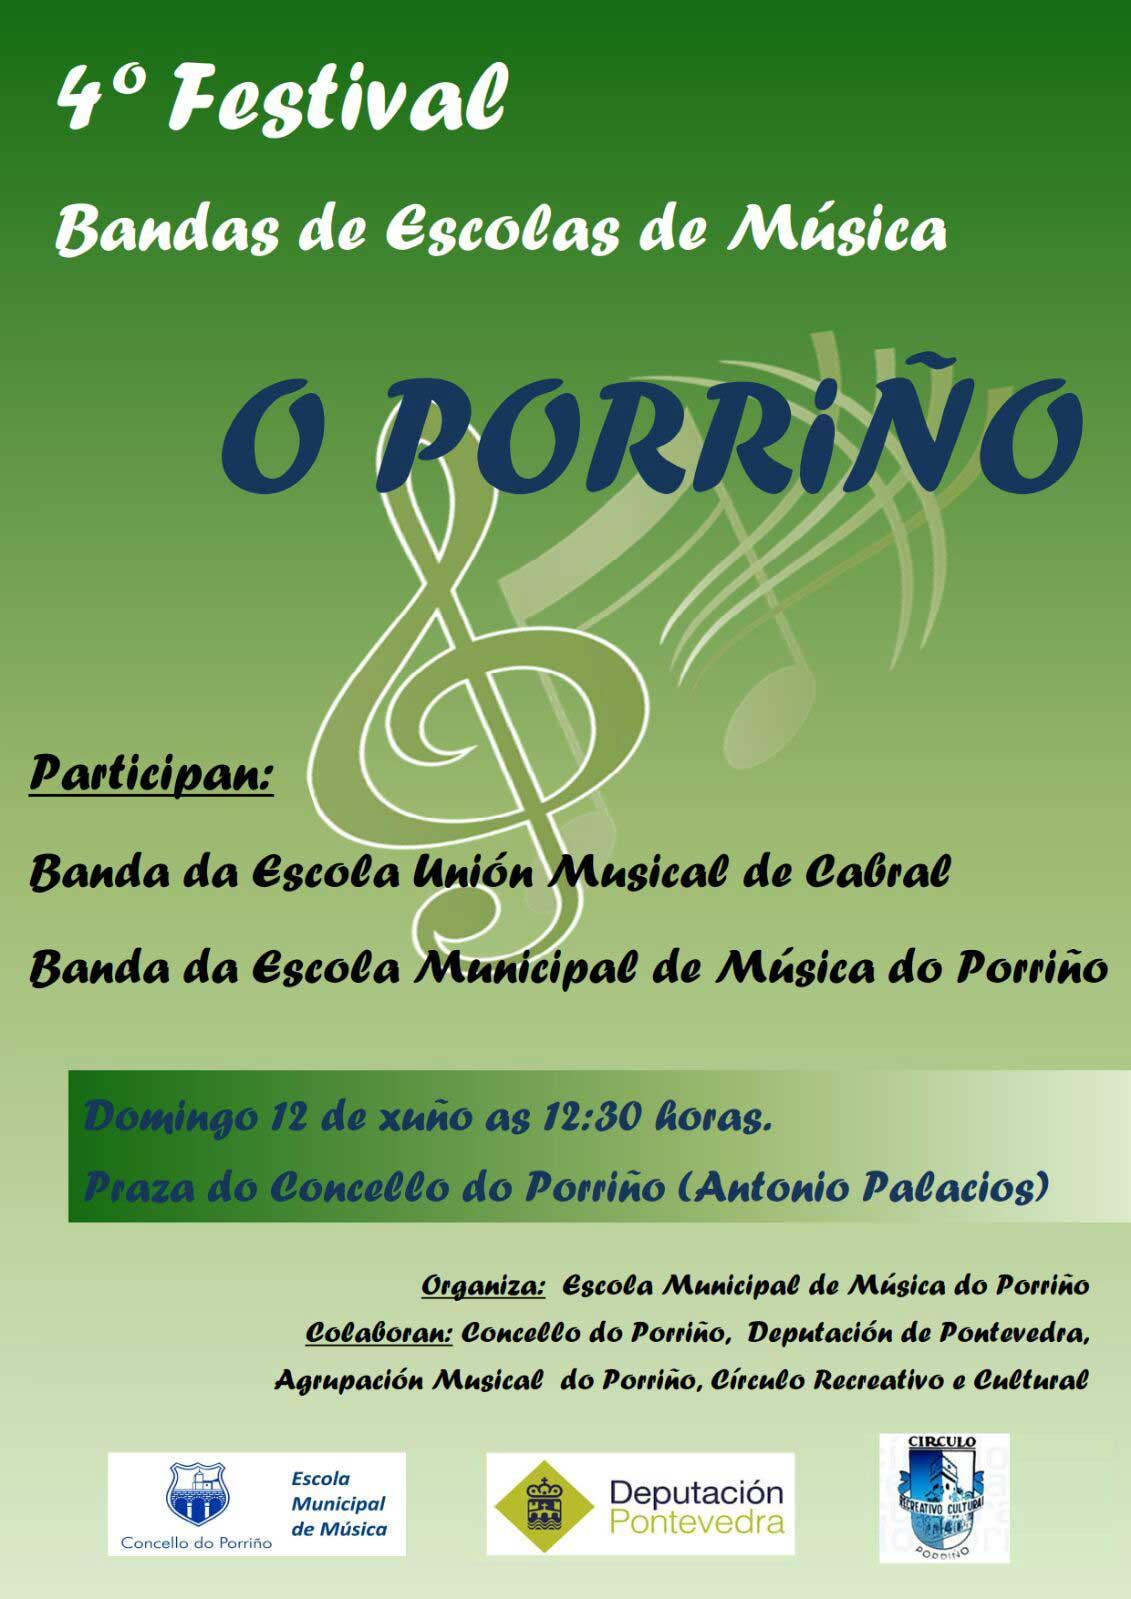 4-festival-bandas-escolas-Porriño